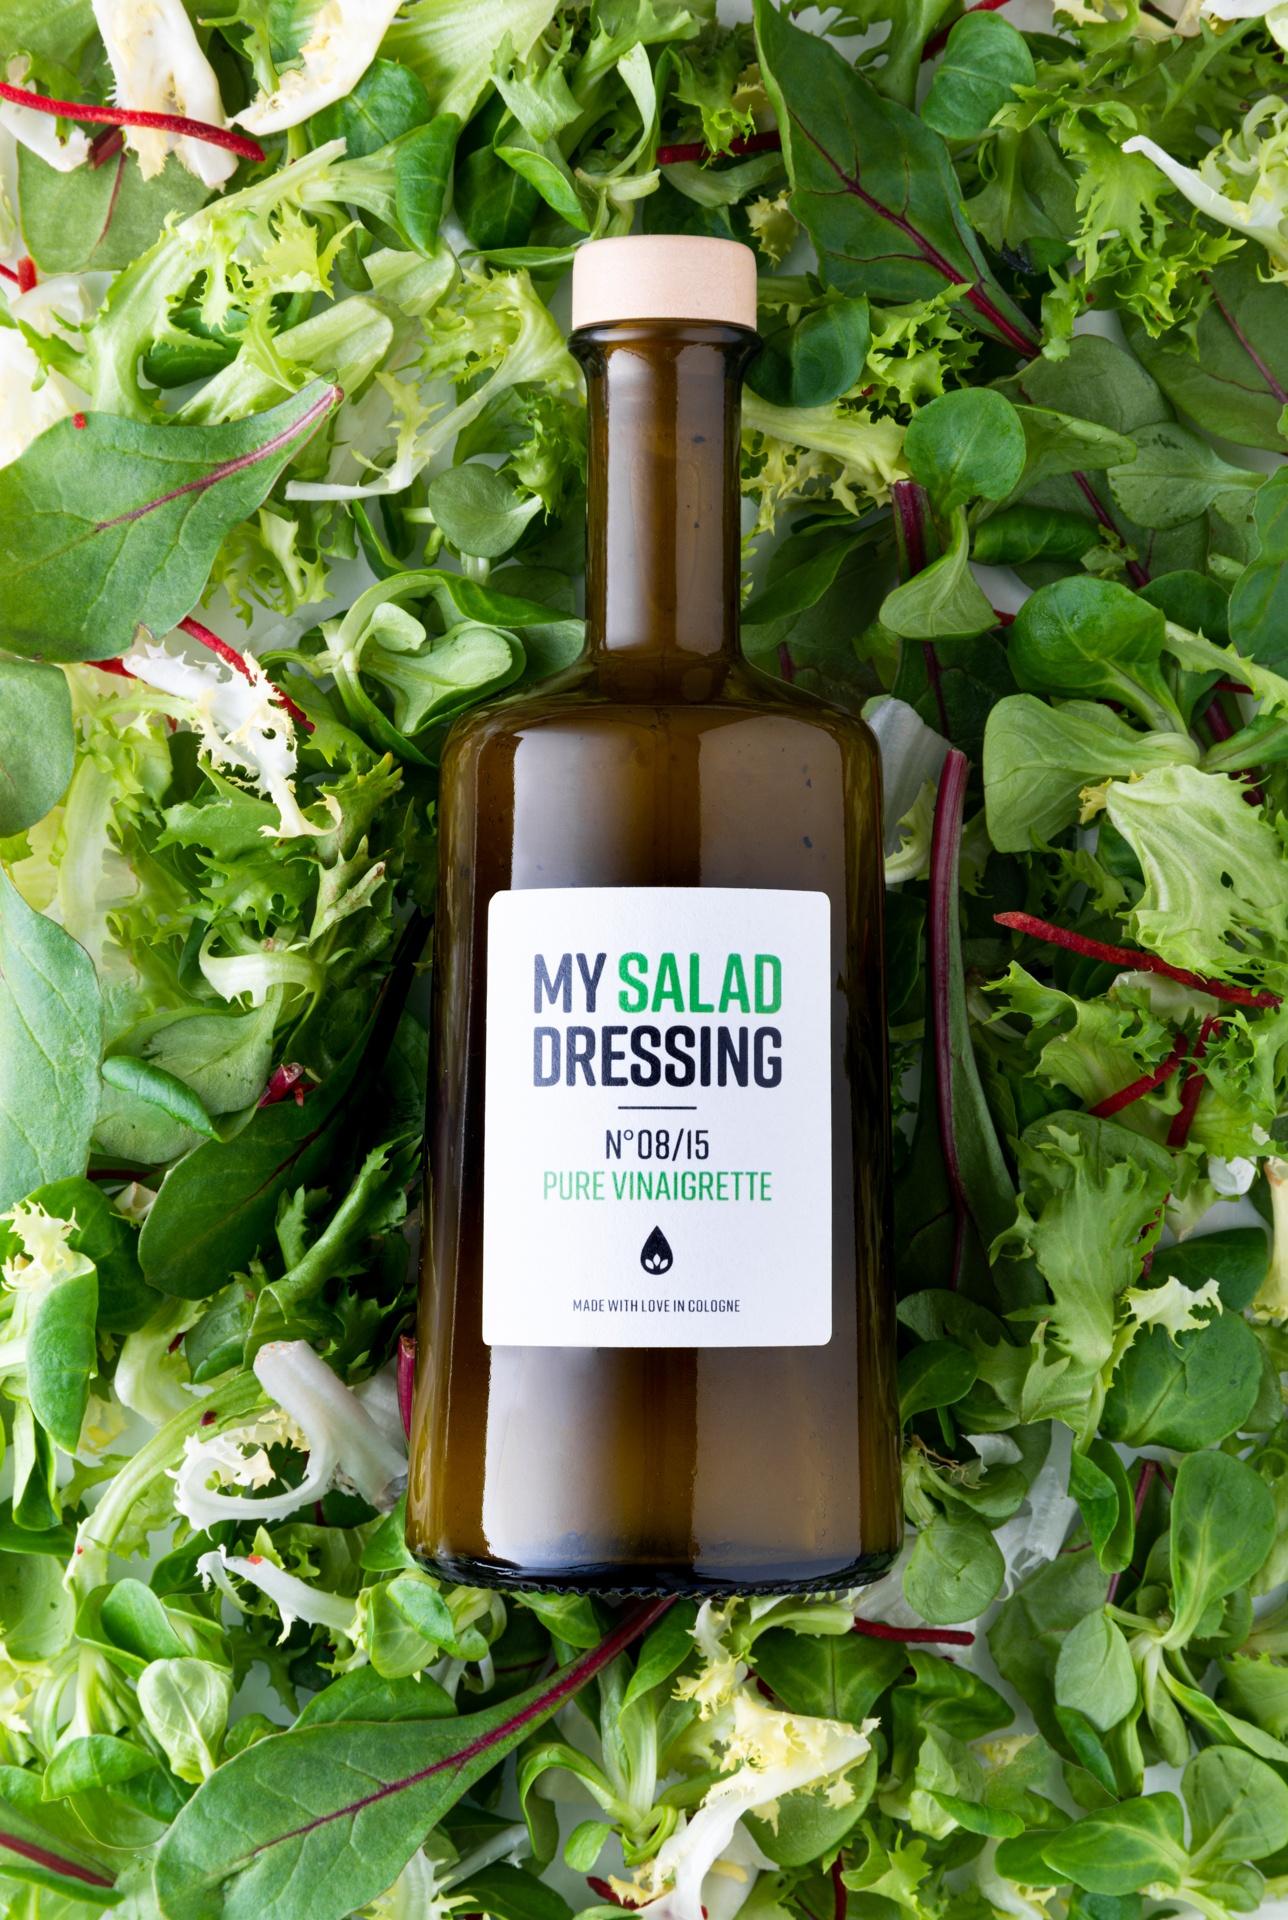 My Salad Dressing No08/15Pure Vinaigrette Produktbild Hintergrund Salat